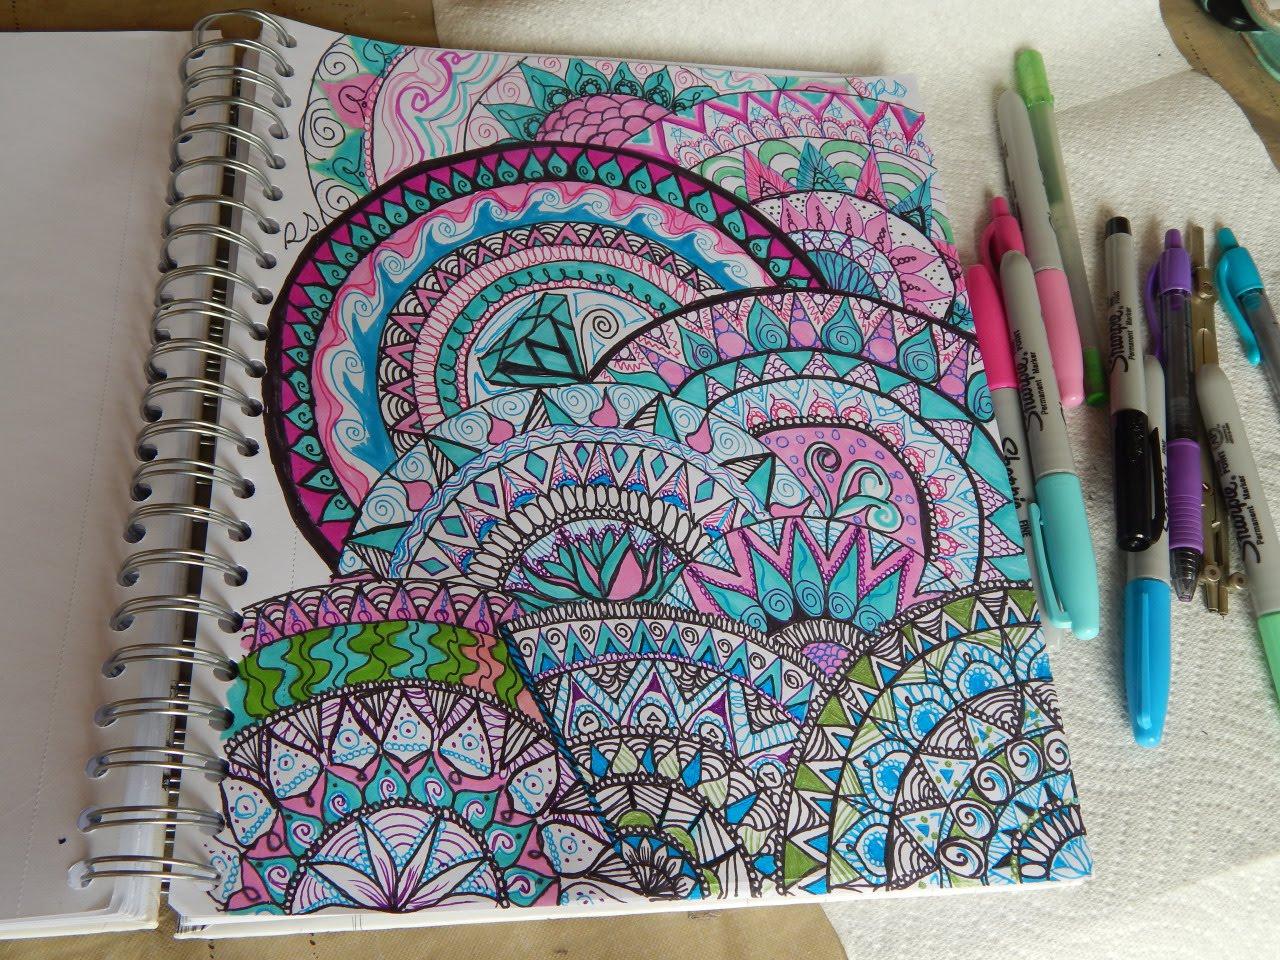 1280x960 Colorful Full Page Mandala